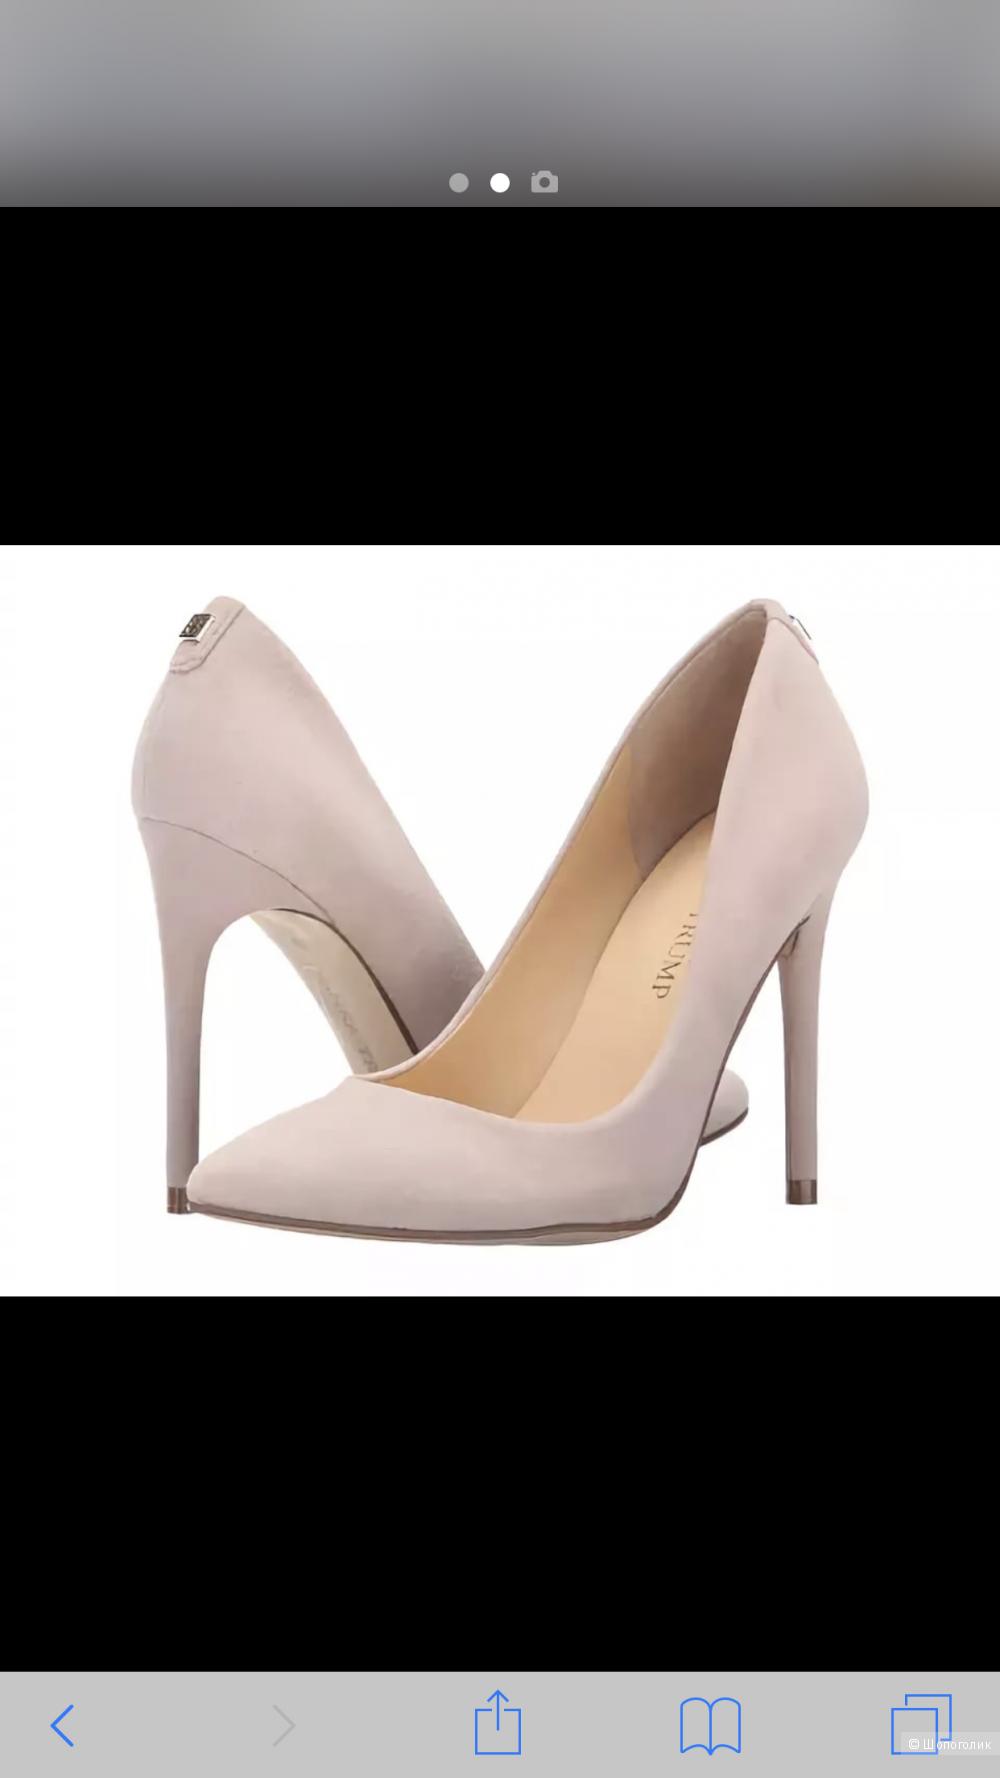 Туфли Ivanka Trump,39 размер